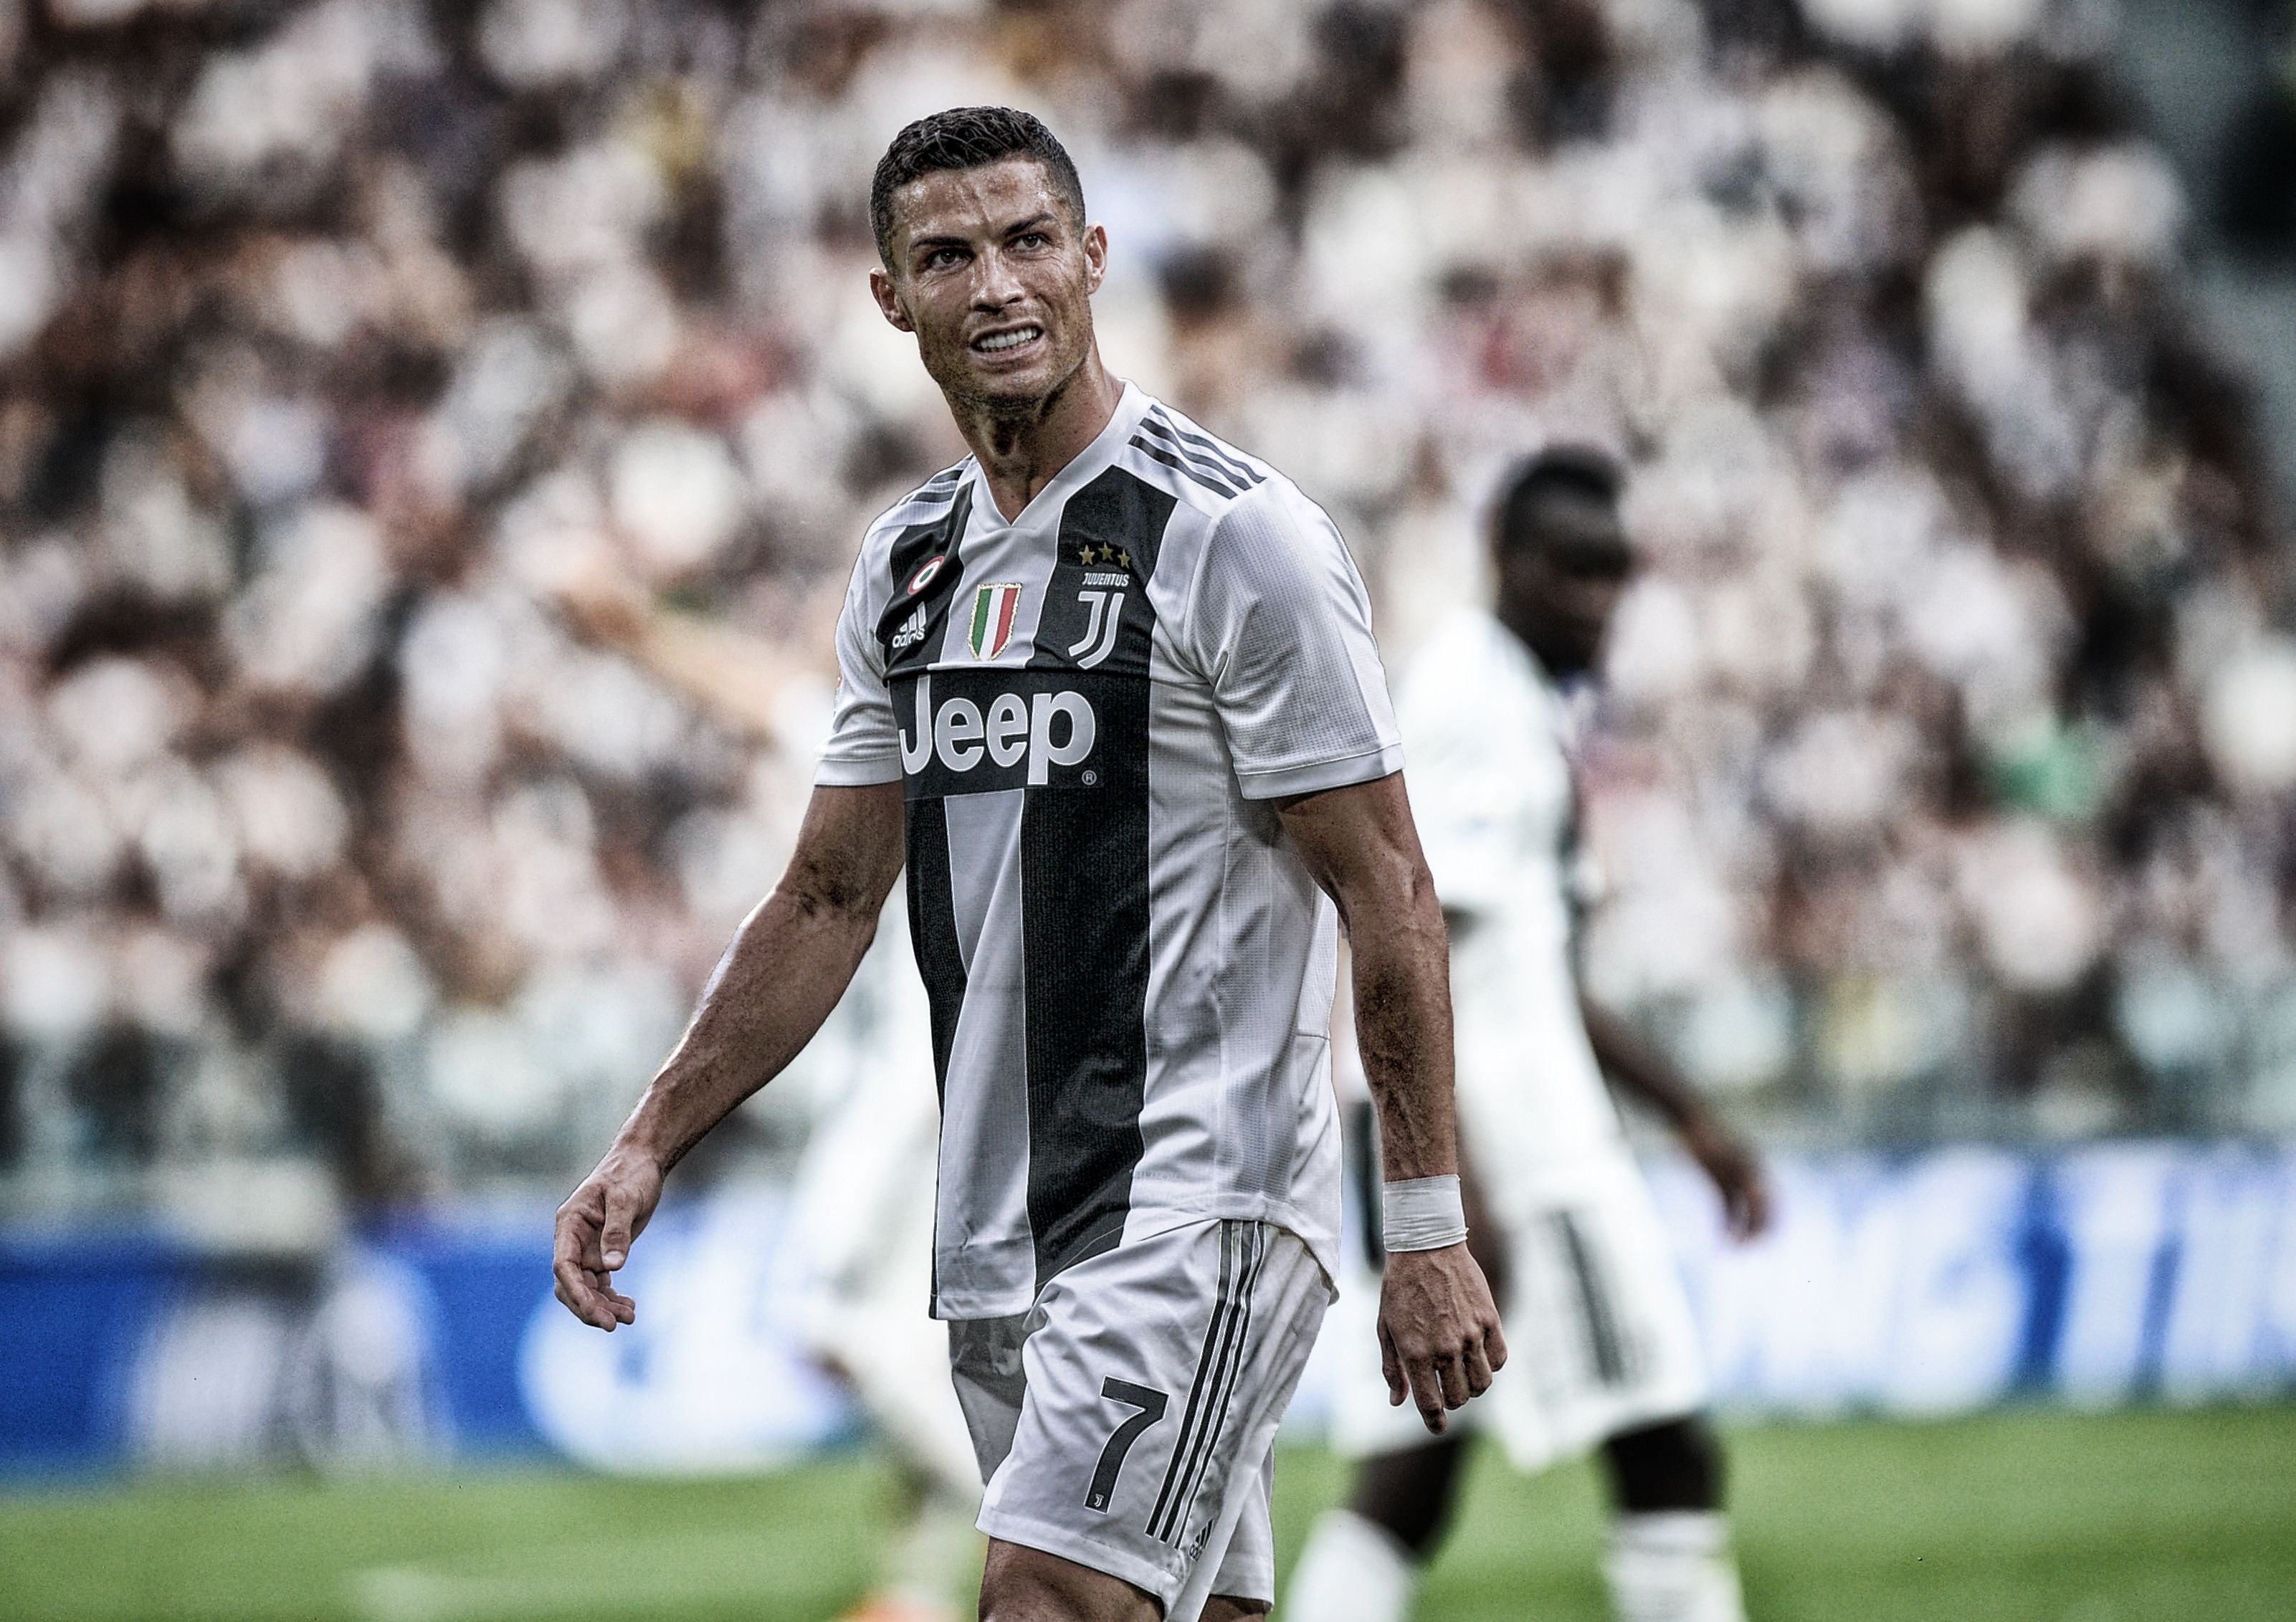 Cristiano Ronaldo Juventus Wallpaper Hd Dysse Fr Ronaldo